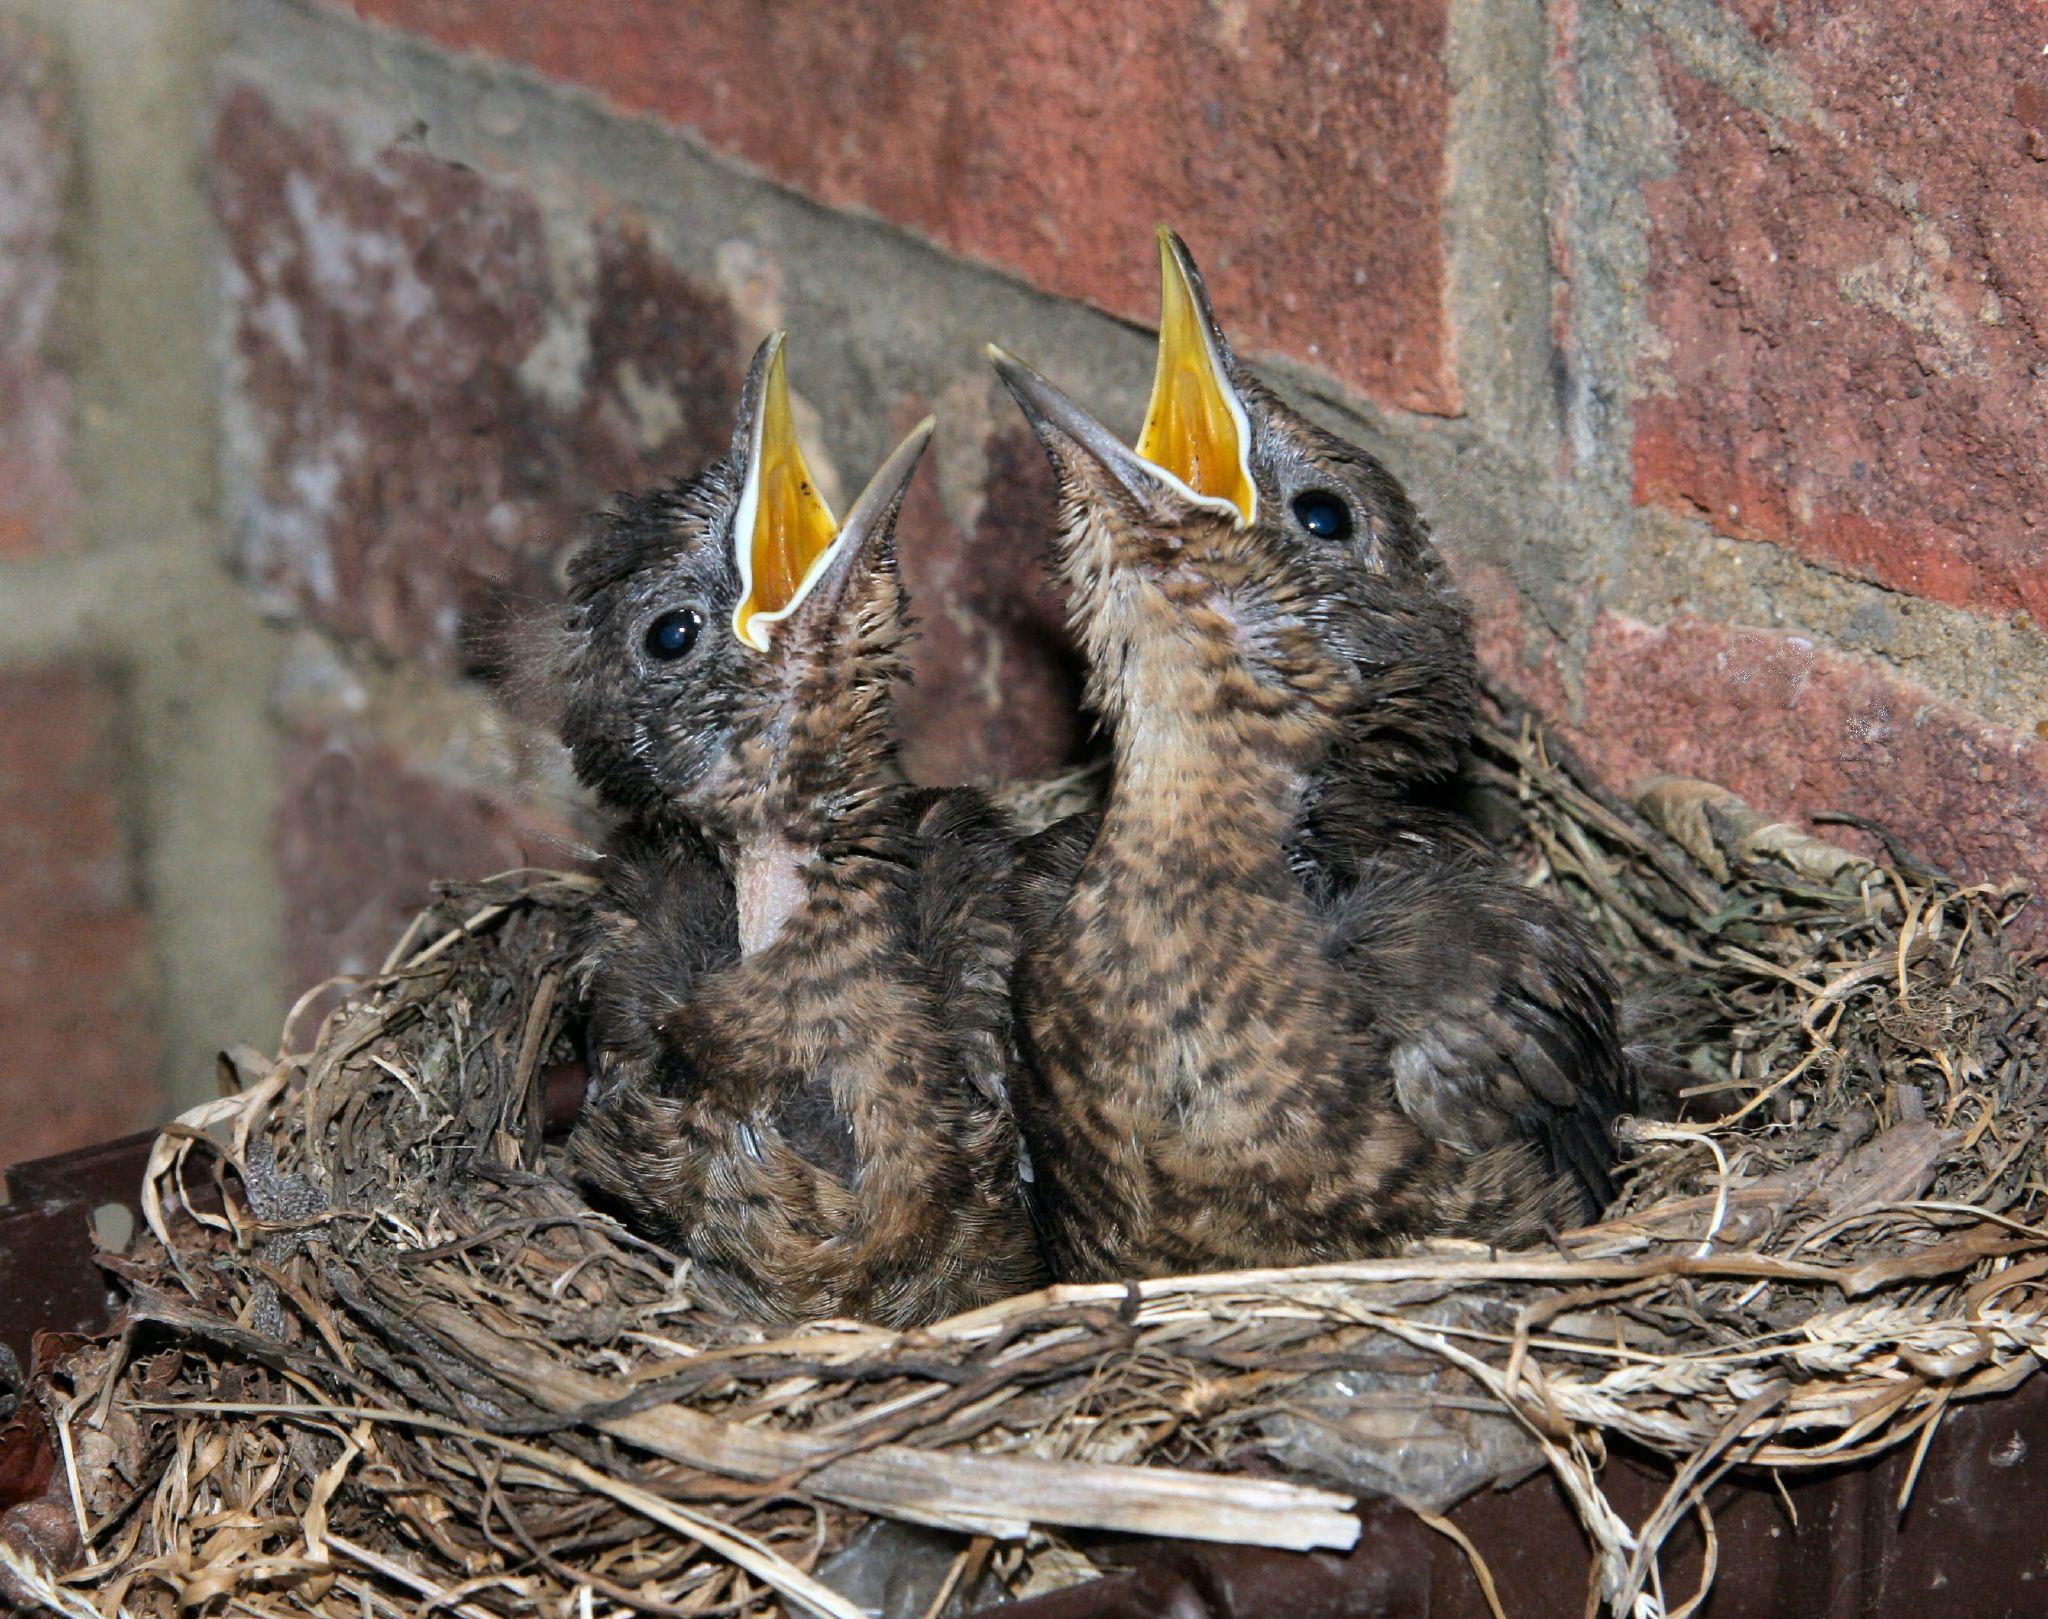 https://upload.wikimedia.org/wikipedia/commons/b/bb/Turdus_merula_-England_-chicks_in_nest-8_(2).jpg